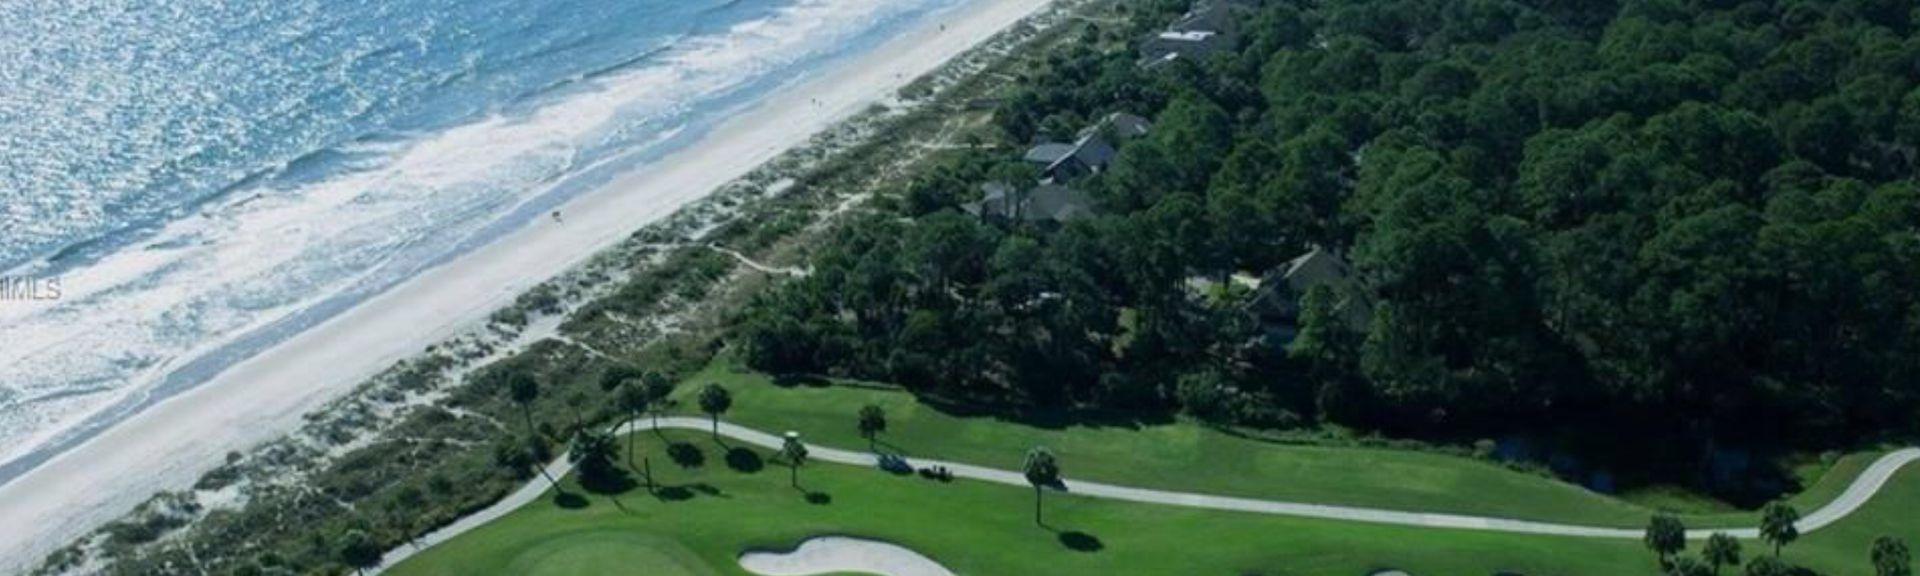 Barrington Arms (Île de Hilton-Head, Caroline du Sud, États-Unis)